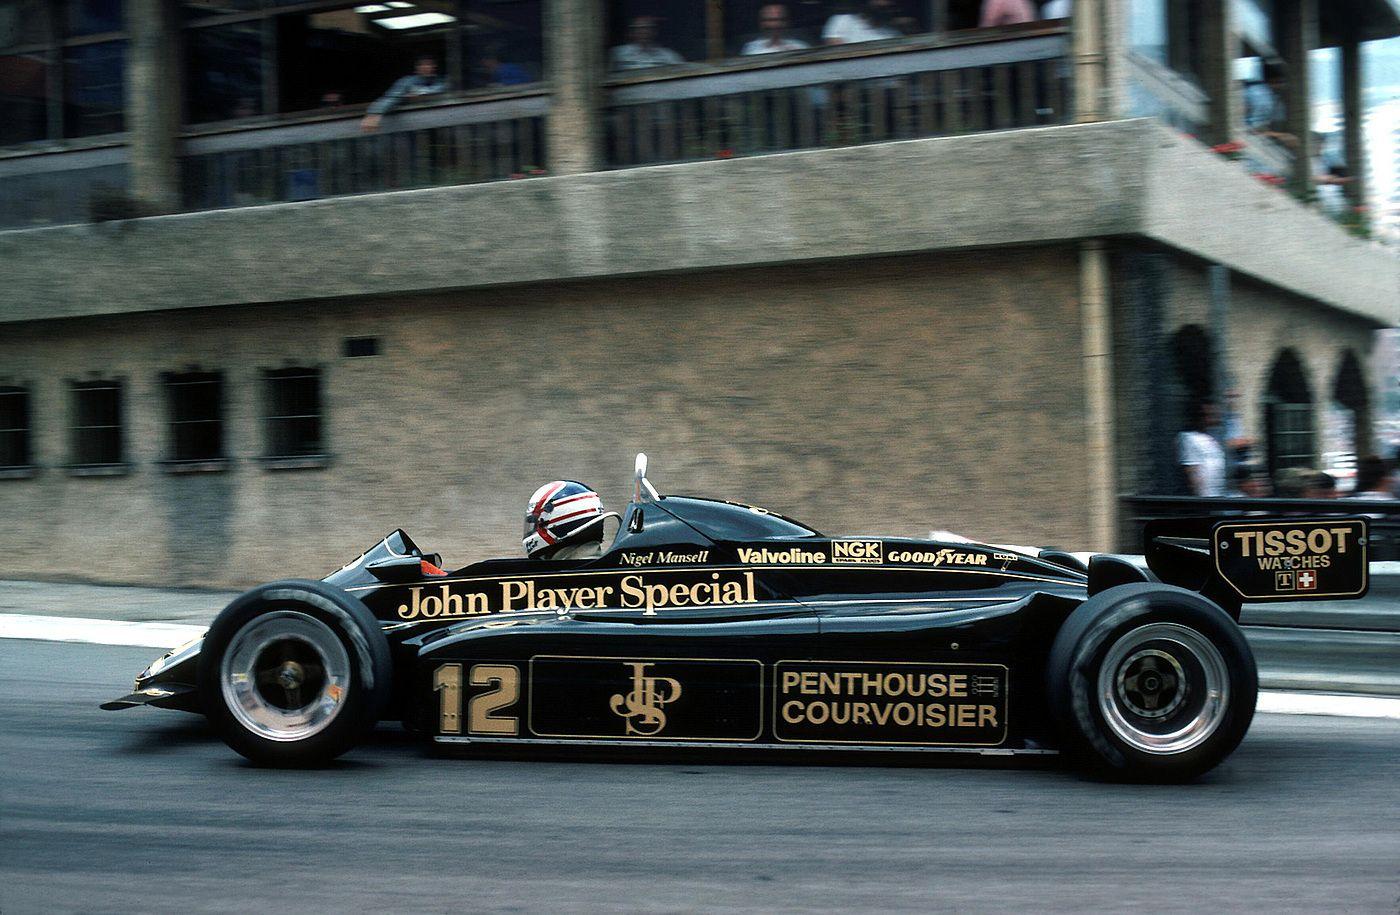 Temporada 1982 de Fórmula 1 (I) | Autos y motocicletas, Autos, F1 lotus